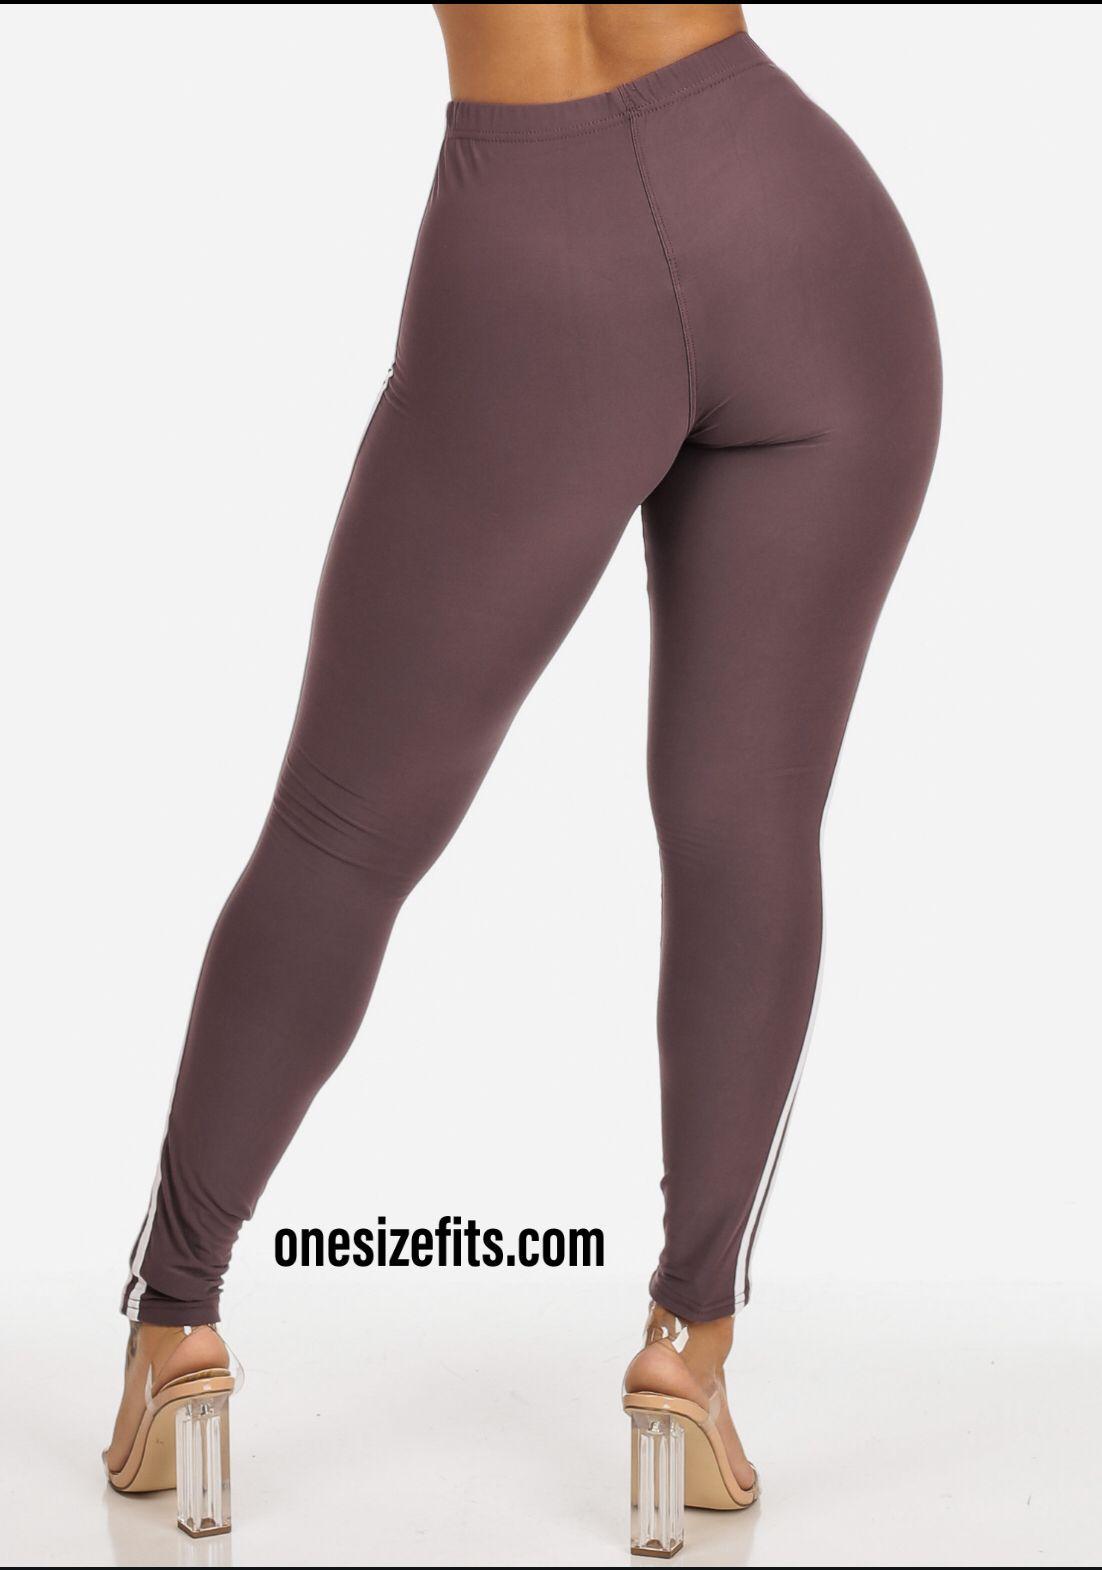 e2d95f51fa807 Raisin Color Women,s Skinny Fit Waistline Leggings Pants SOLO1R ...